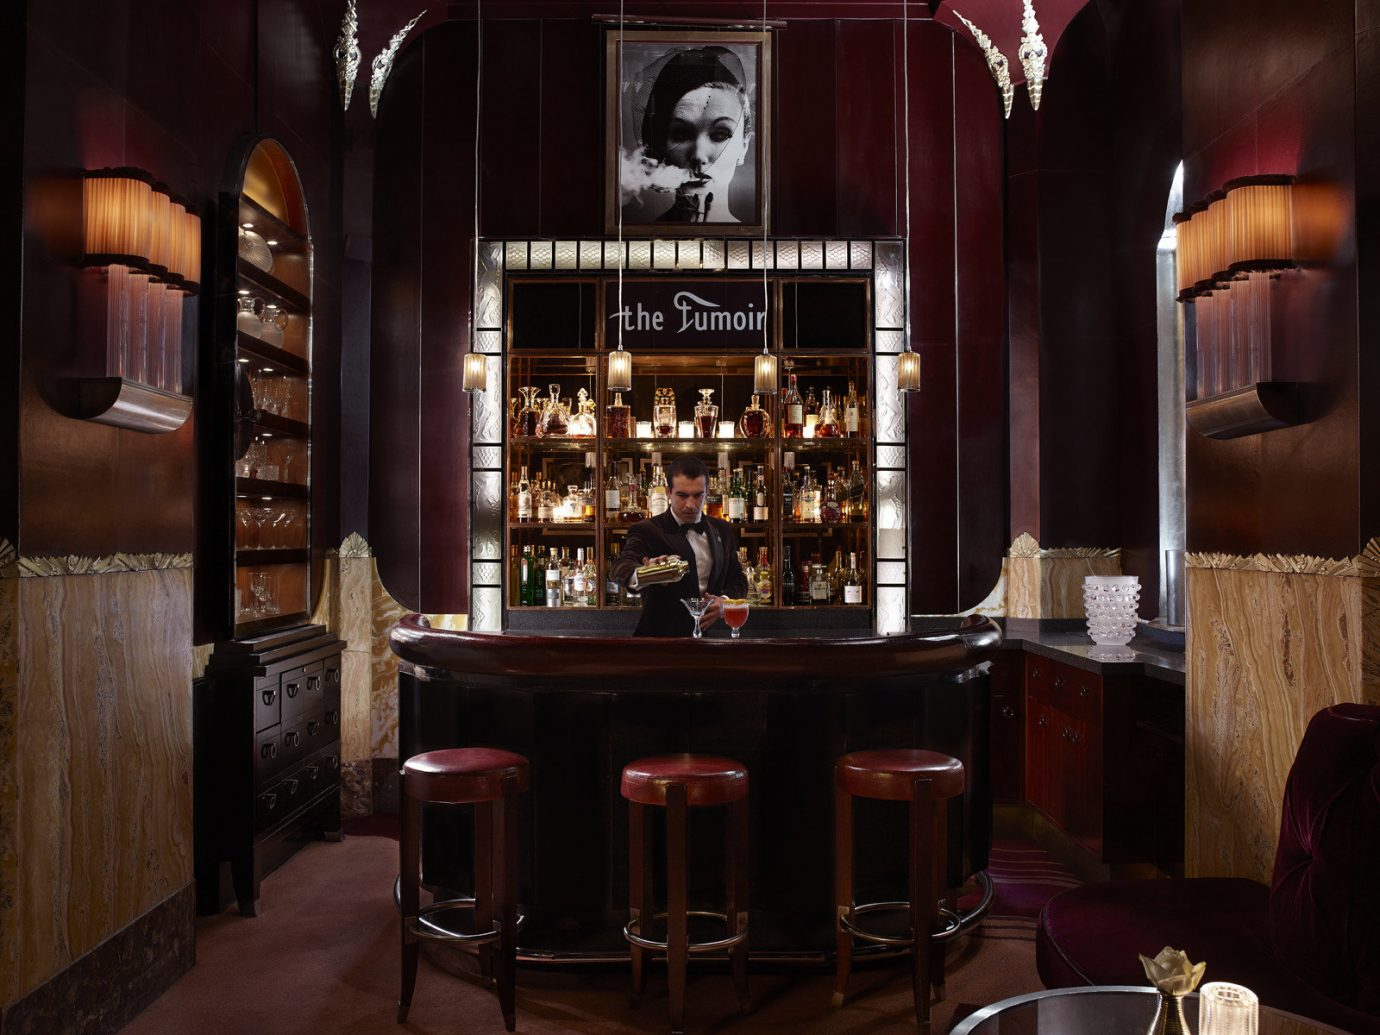 Hotels London Luxury Travel indoor Bar restaurant interior design lighting Winery estate